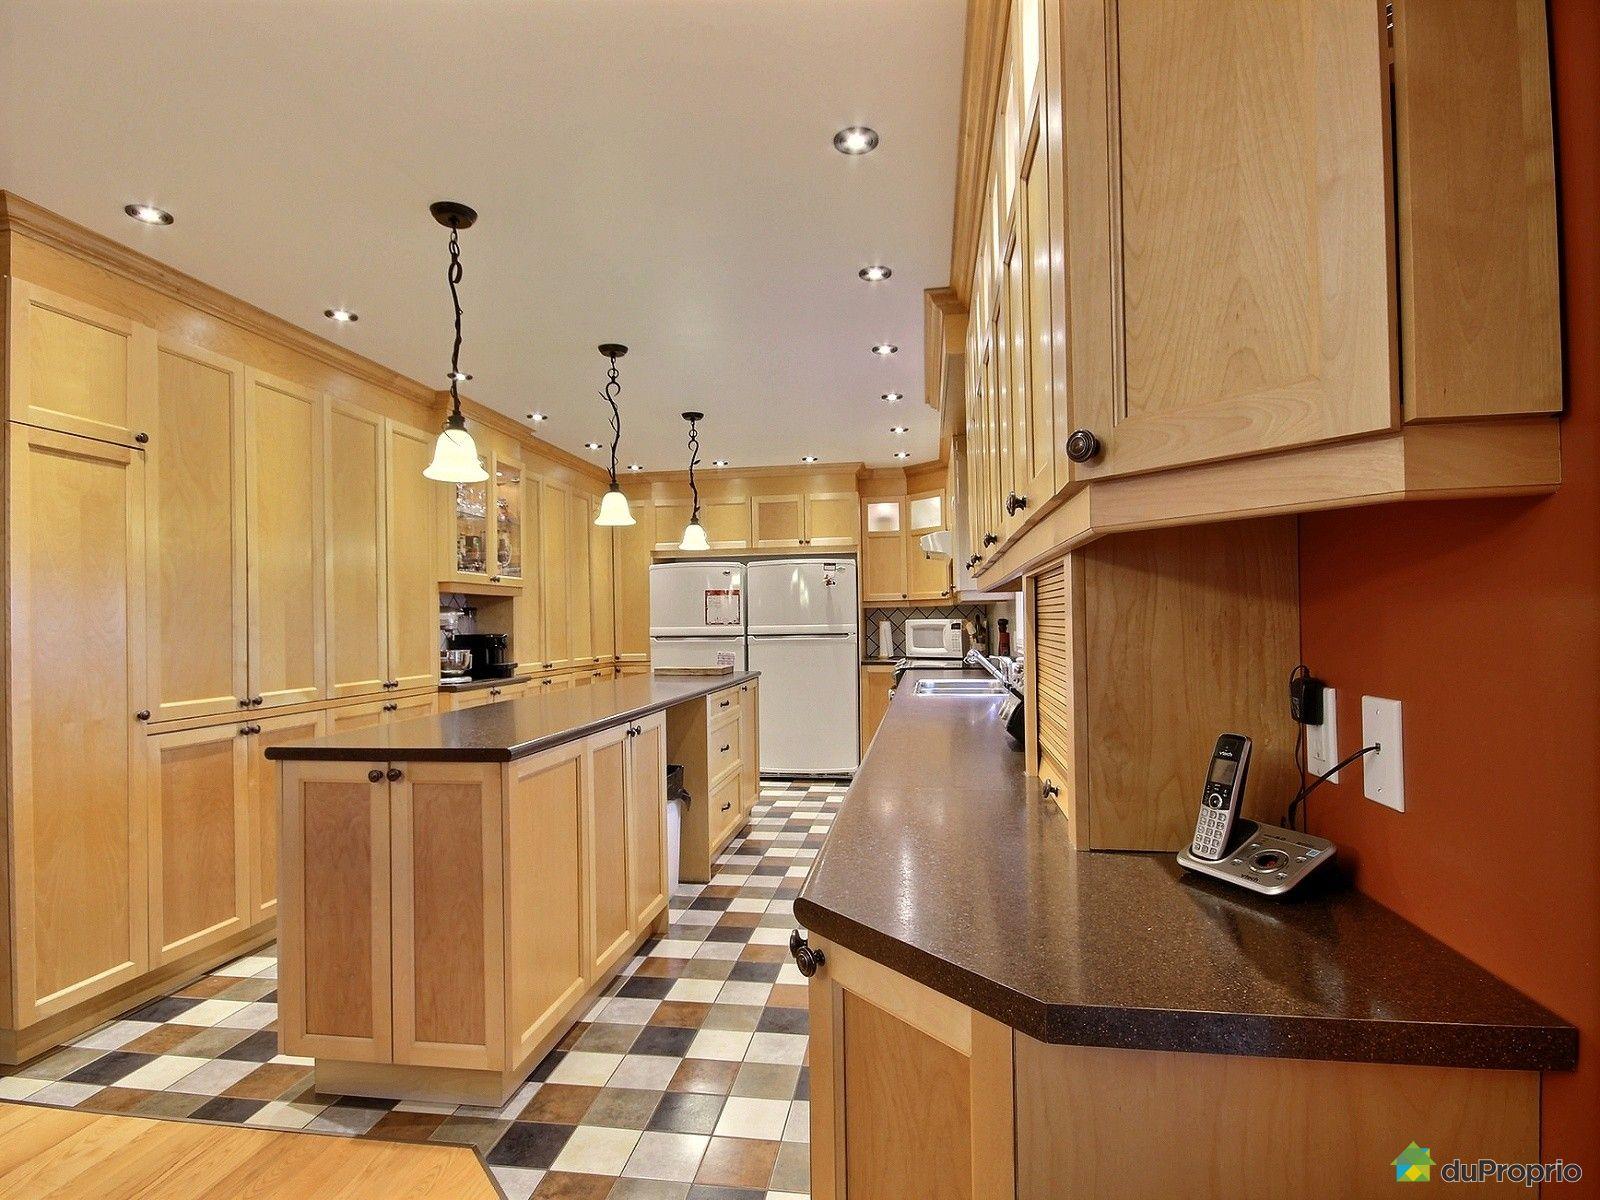 maison vendre st tienne de beauharnois 9 rue madeleine immobilier qu bec duproprio 434757. Black Bedroom Furniture Sets. Home Design Ideas